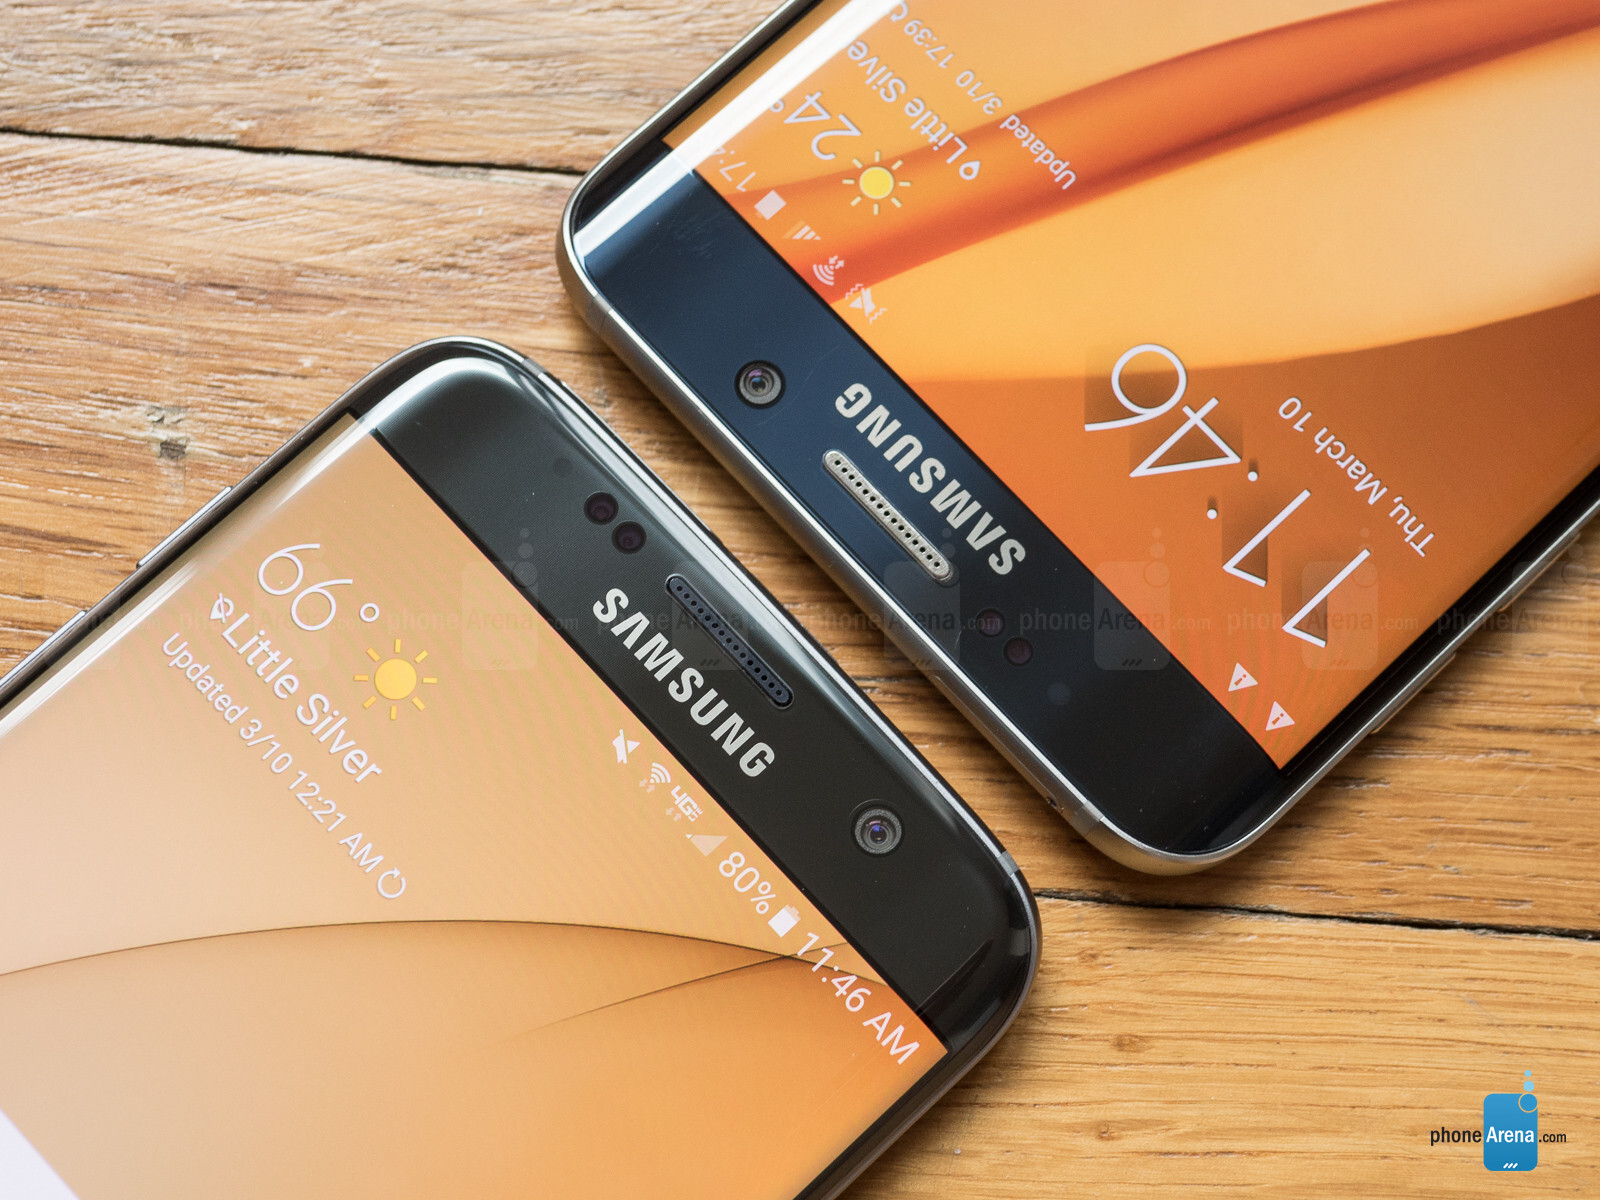 Samsung Galaxy S7 Edge Vs Samsung Galaxy S6 Edge+